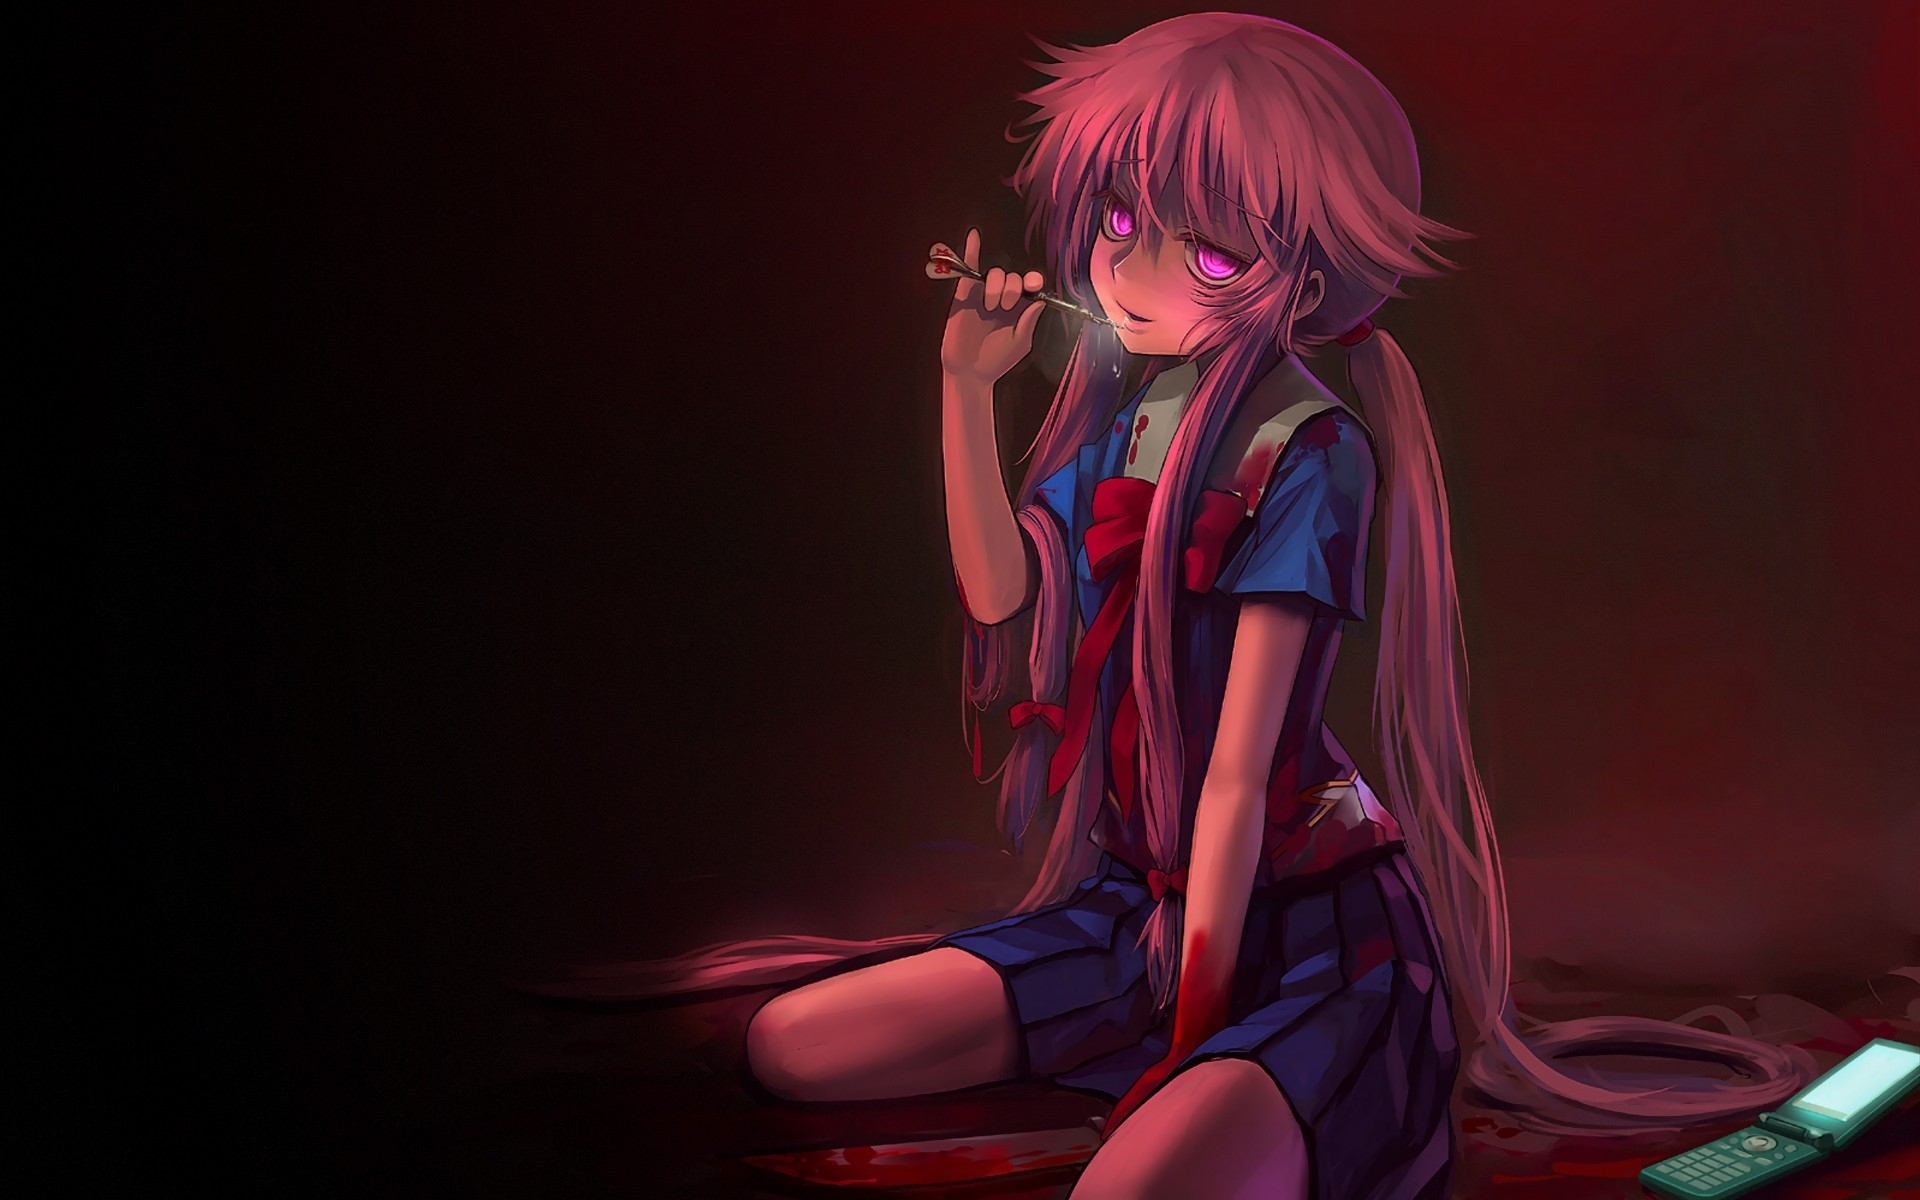 fond d'écran : anime, filles anime, du sang, mirai nikki, gasai yuno